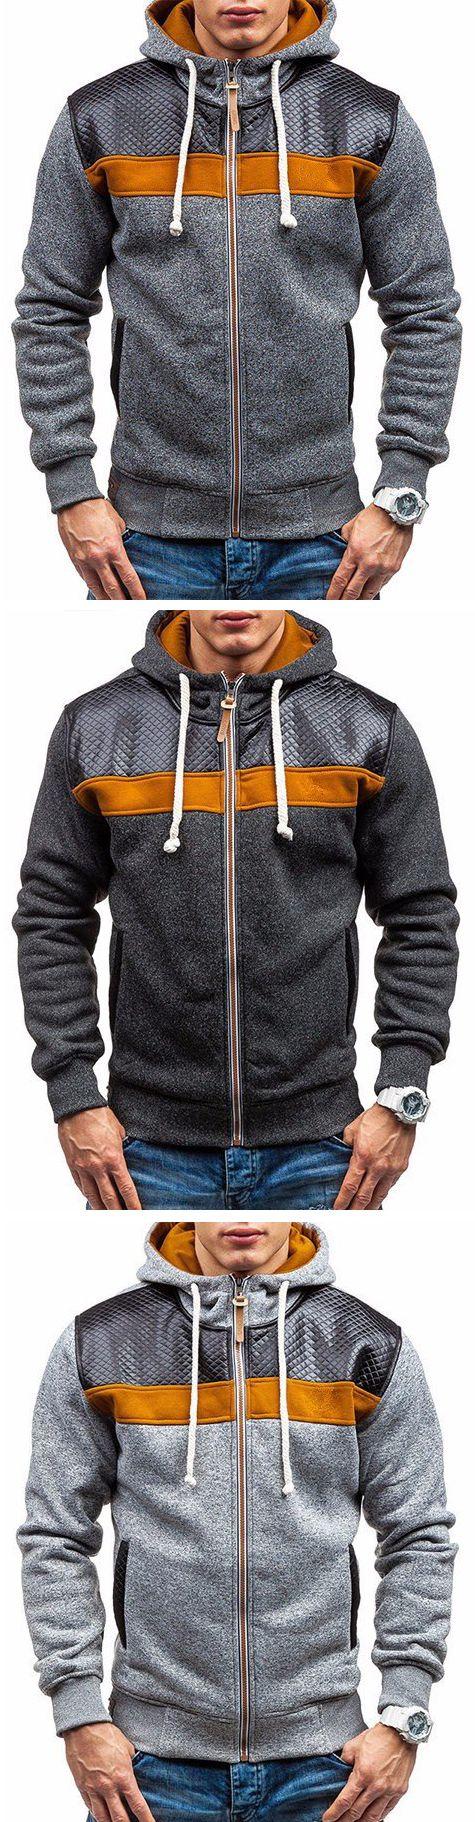 Mens Hoodies Fashion Splicing Zipper Hood Casual Sport Hooded Tops